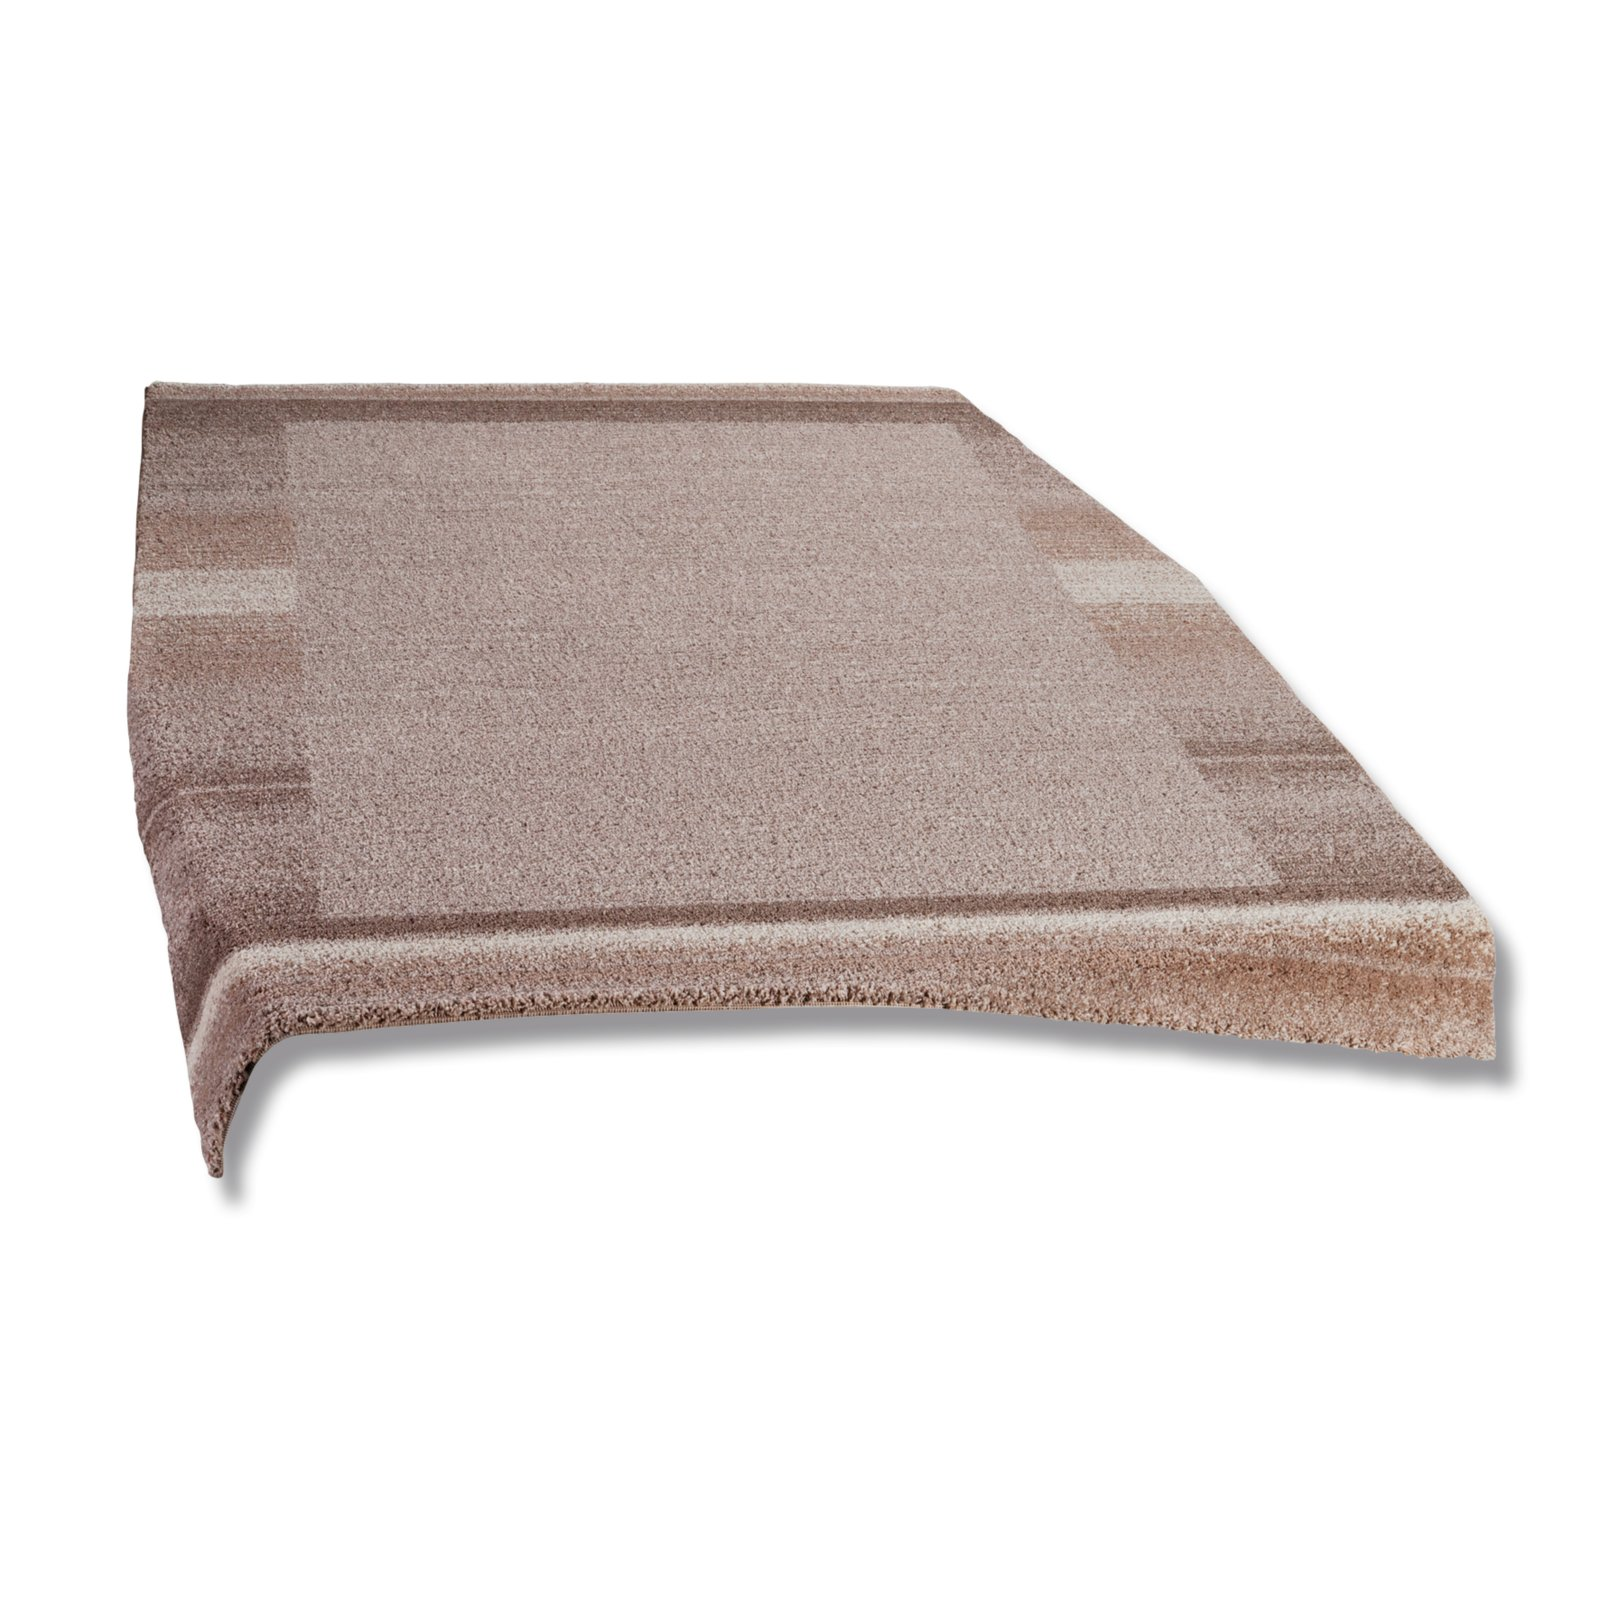 teppich wien natur 160x230 cm gemusterte teppiche teppiche l ufer deko haushalt. Black Bedroom Furniture Sets. Home Design Ideas